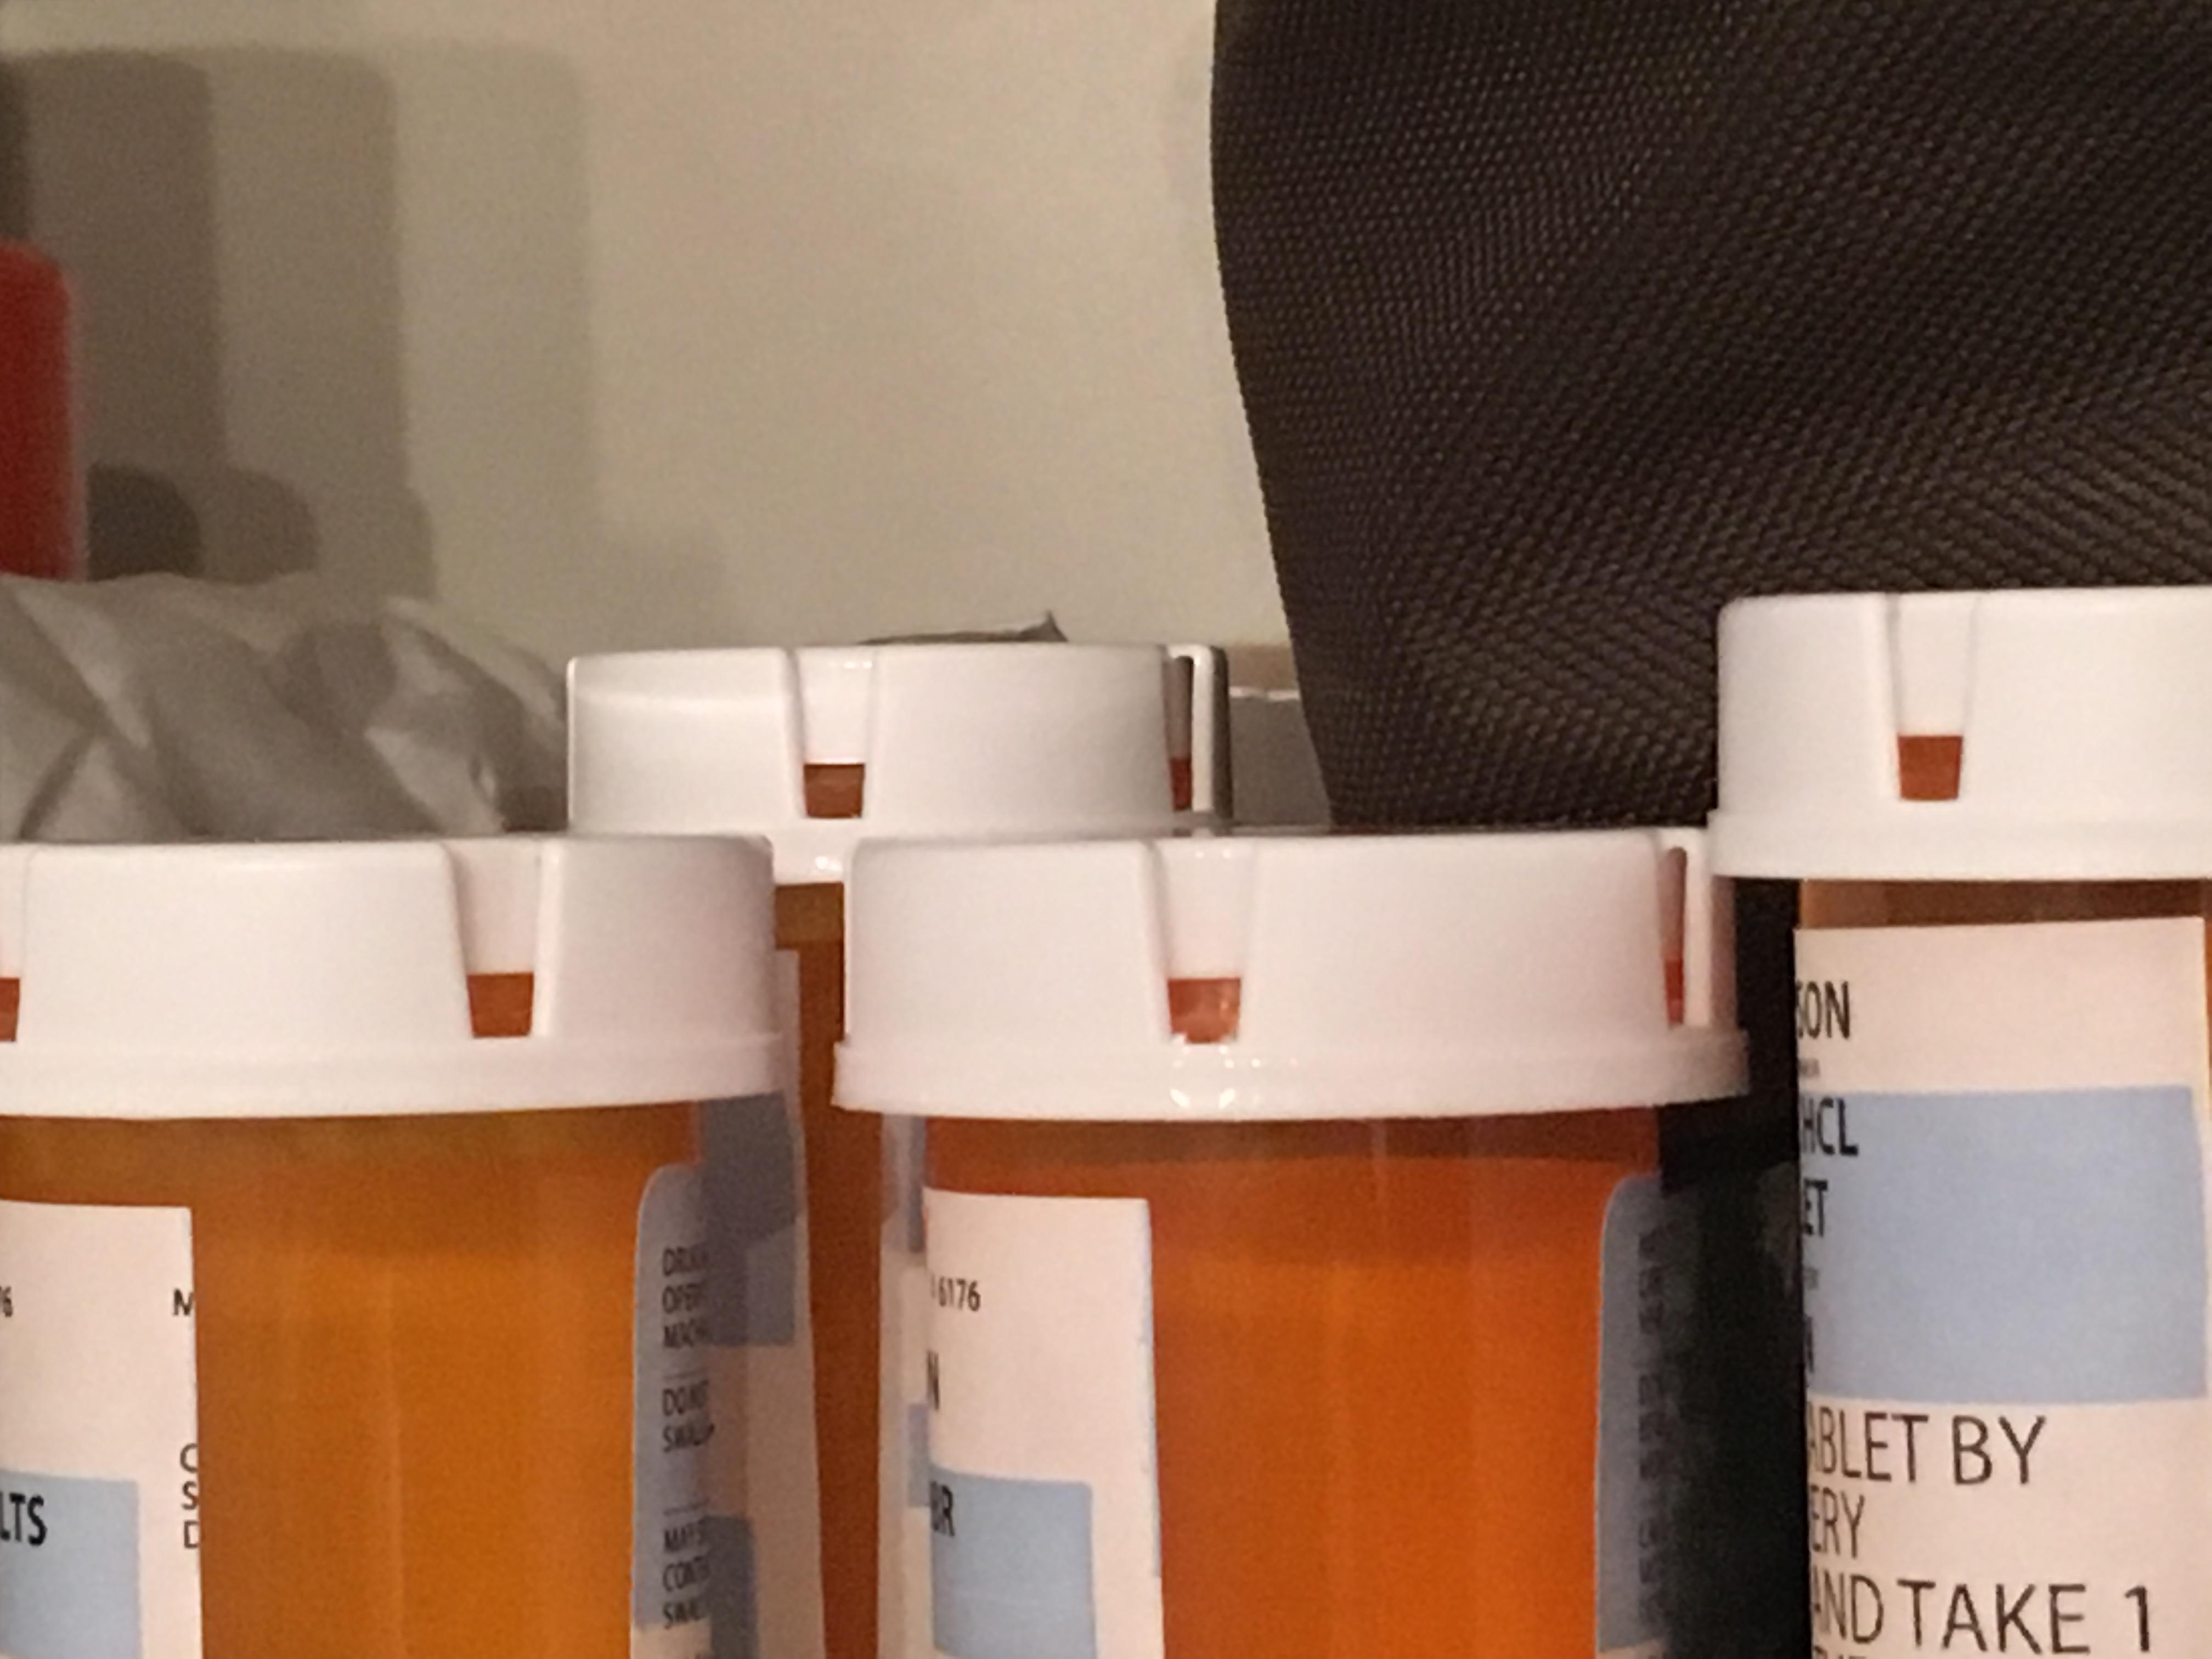 Ben's Medications